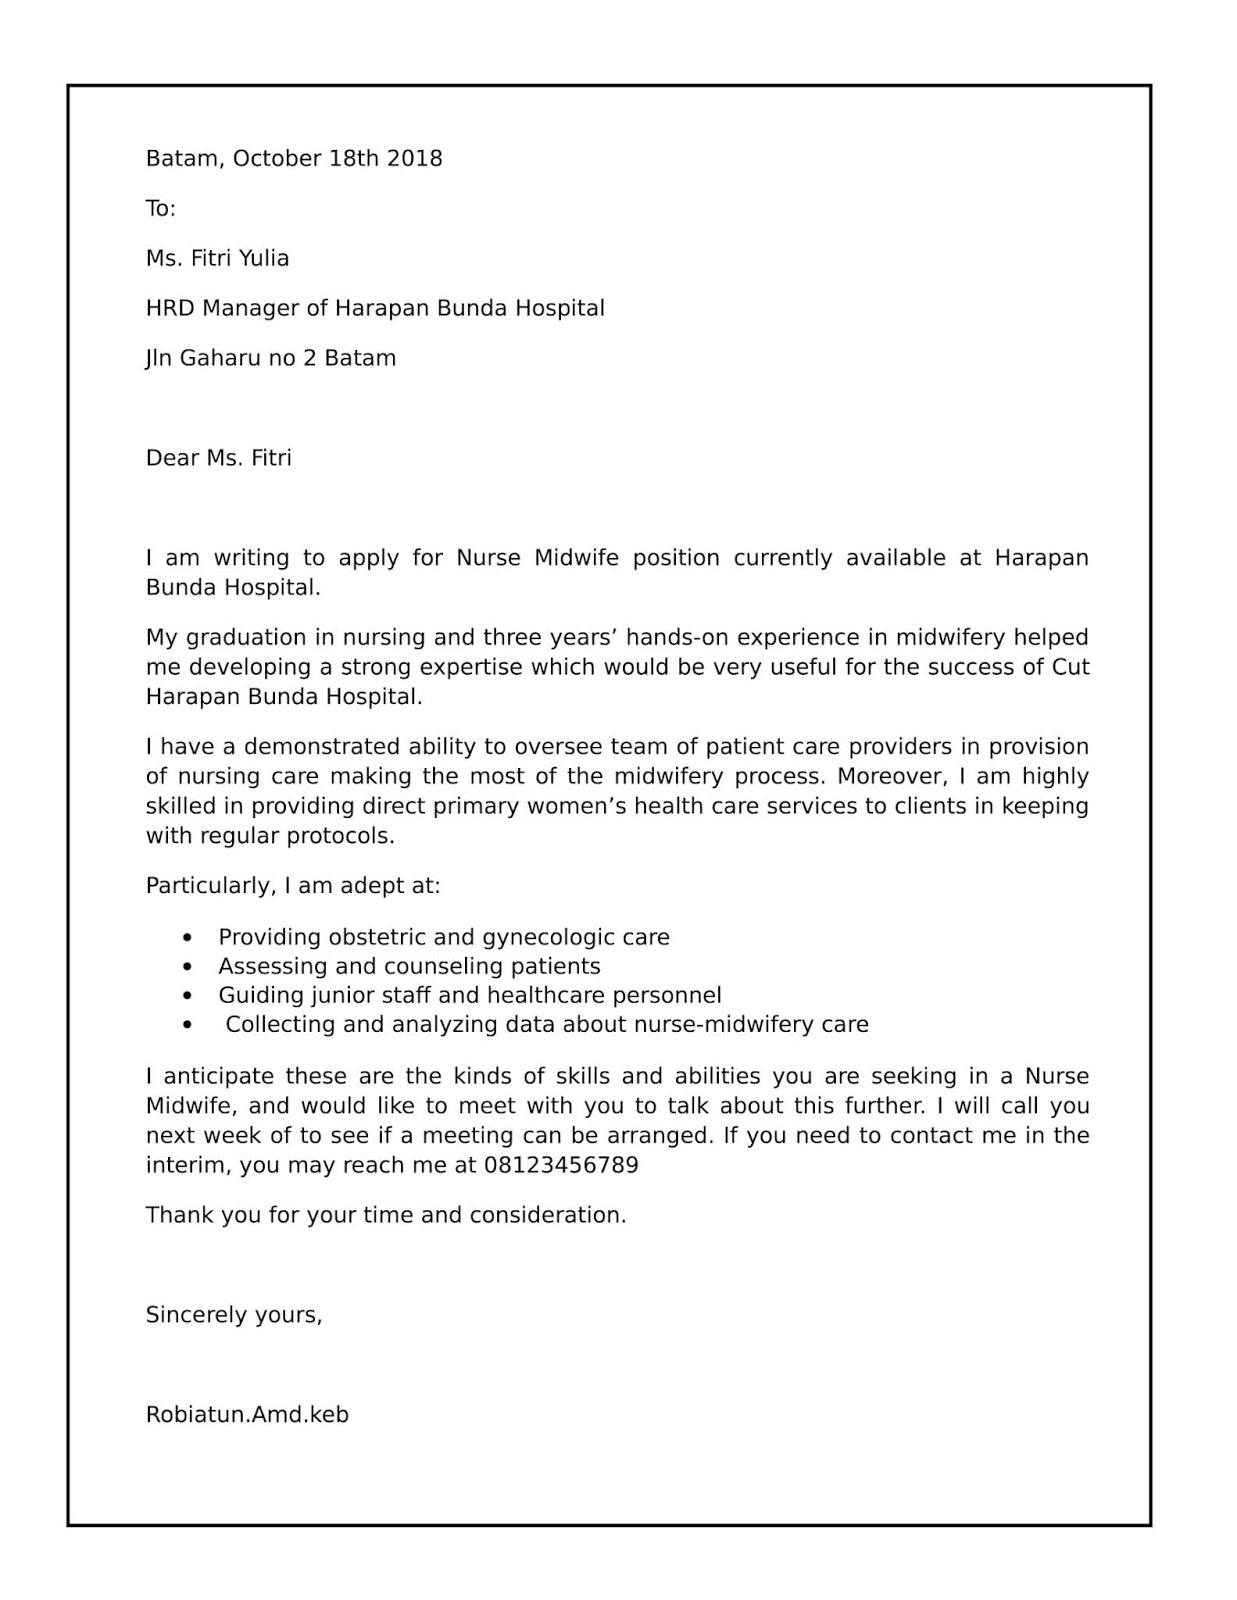 Contoh surat lamaran kerja di rumah sakit dalam bahasa Inggris